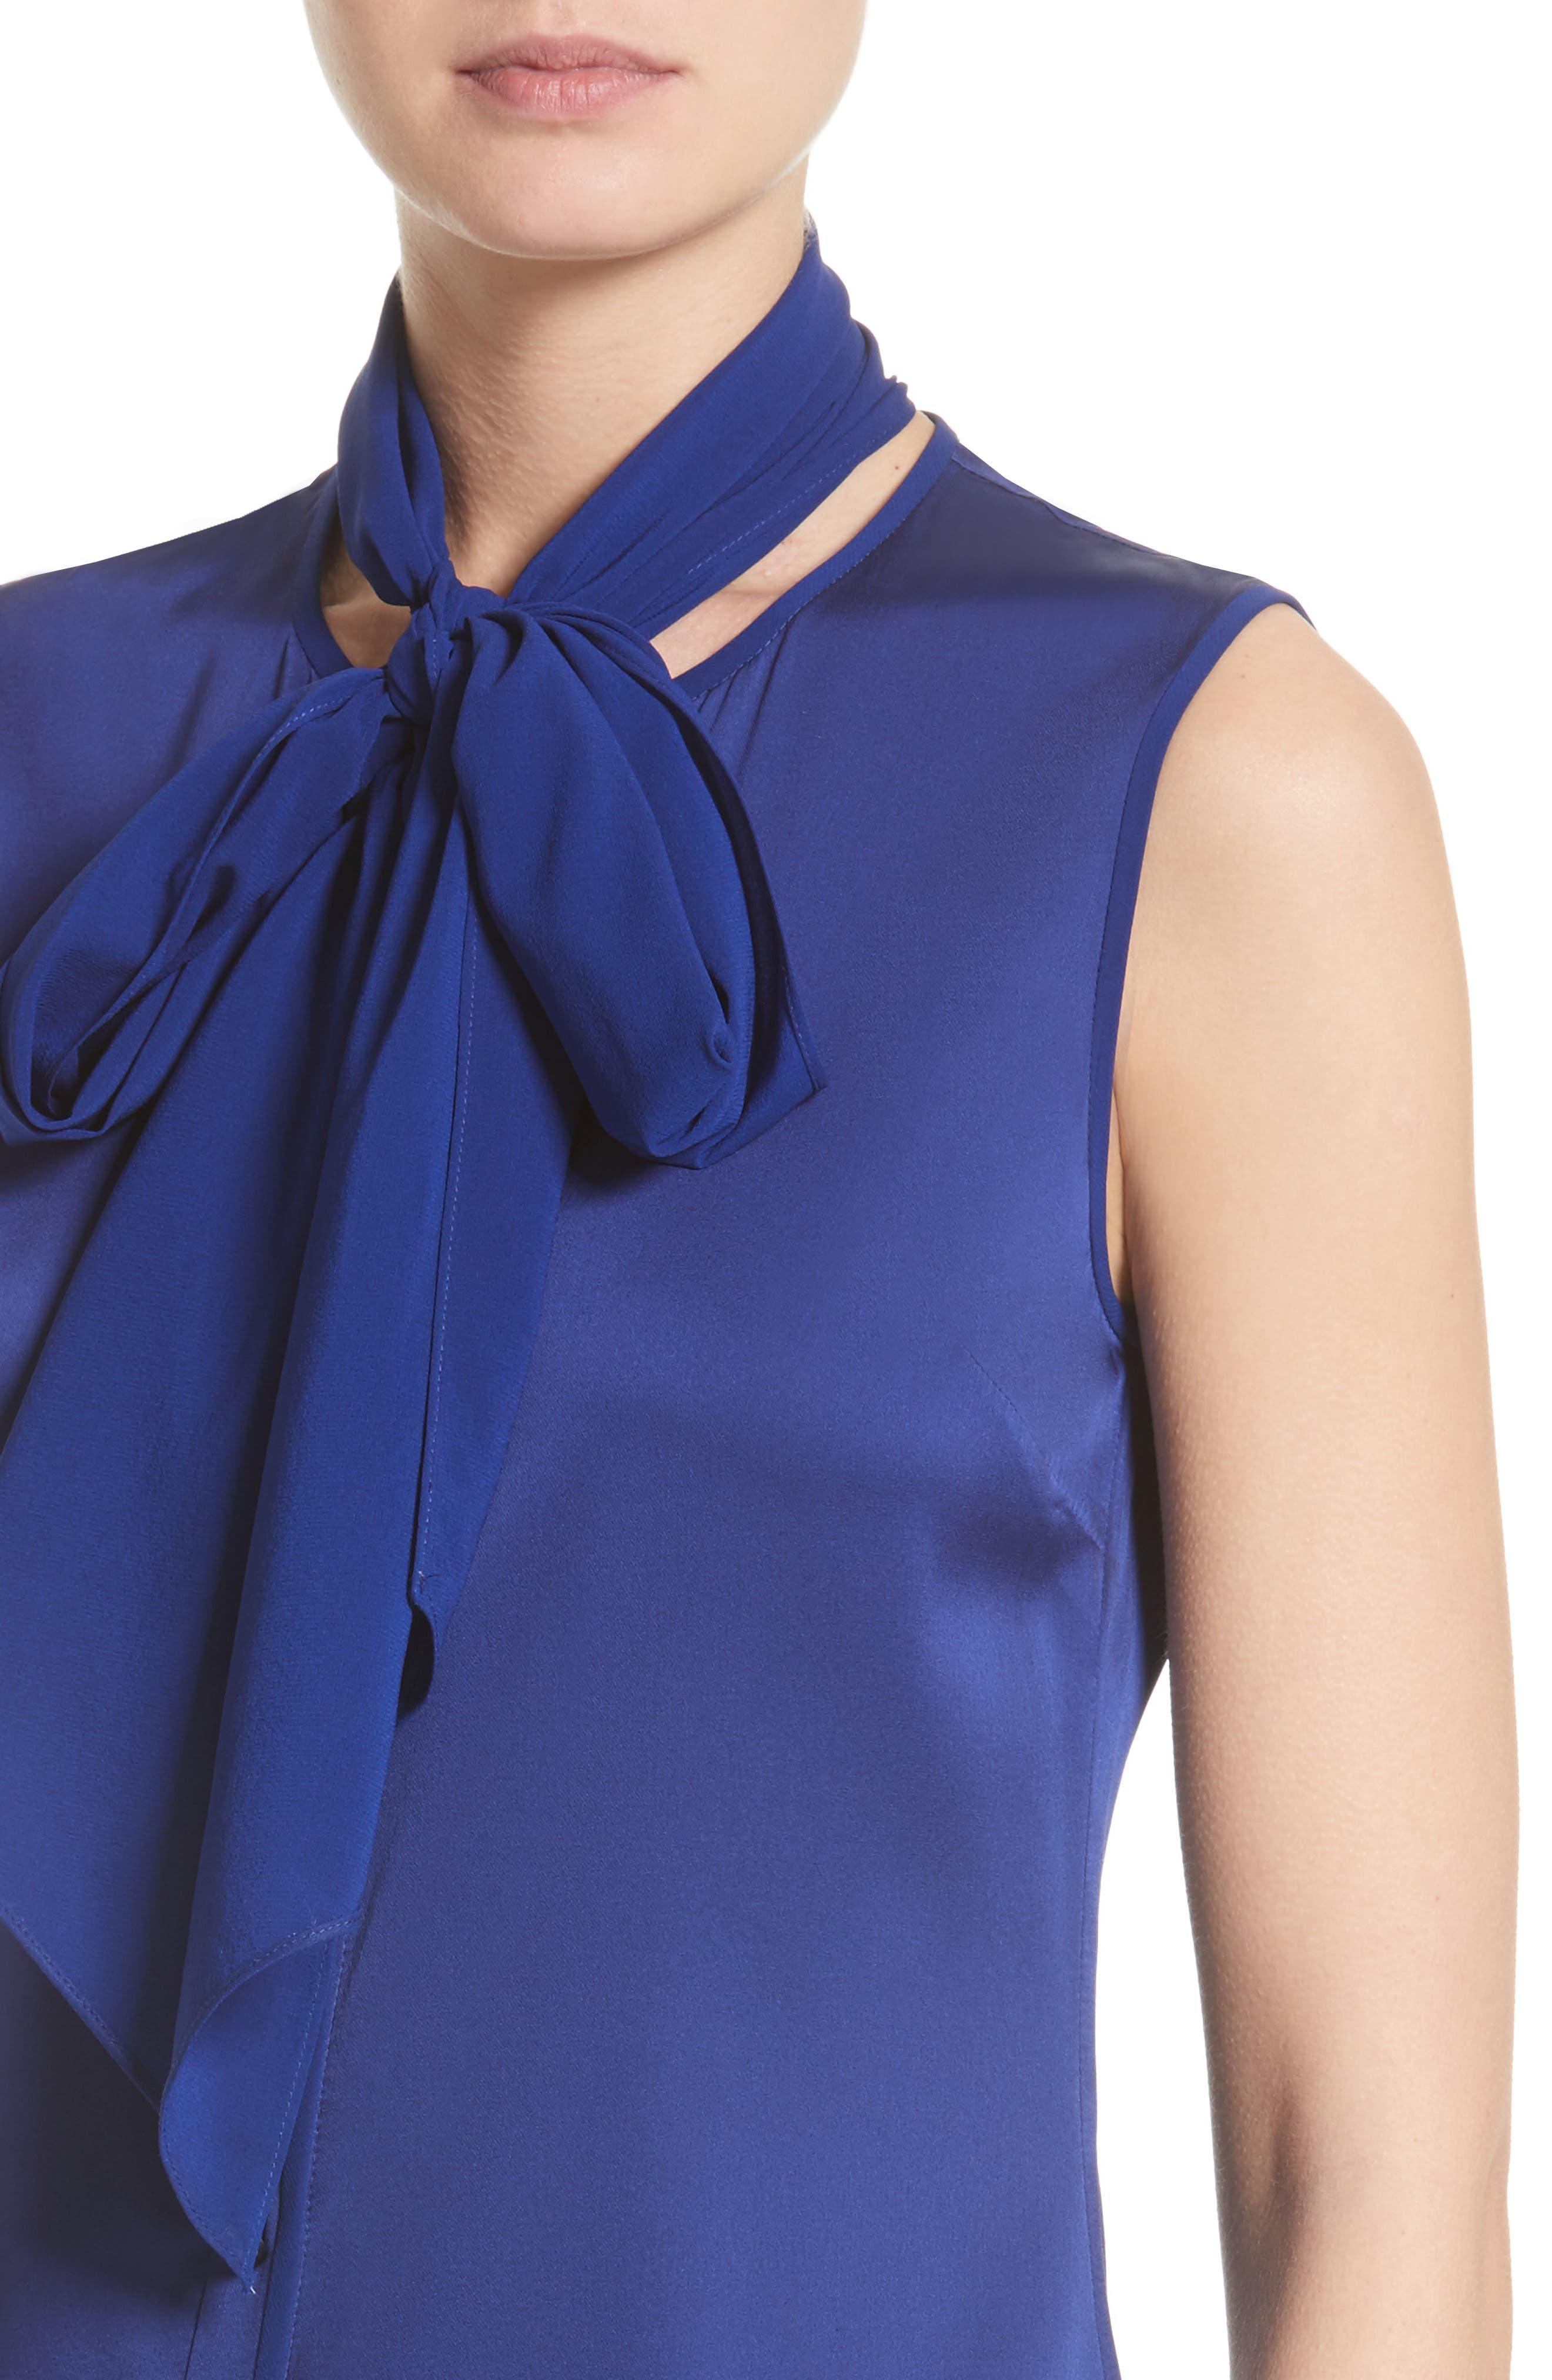 Removable Tie Stretch Silk Satin Georgette Blouse,                             Alternate thumbnail 5, color,                             430